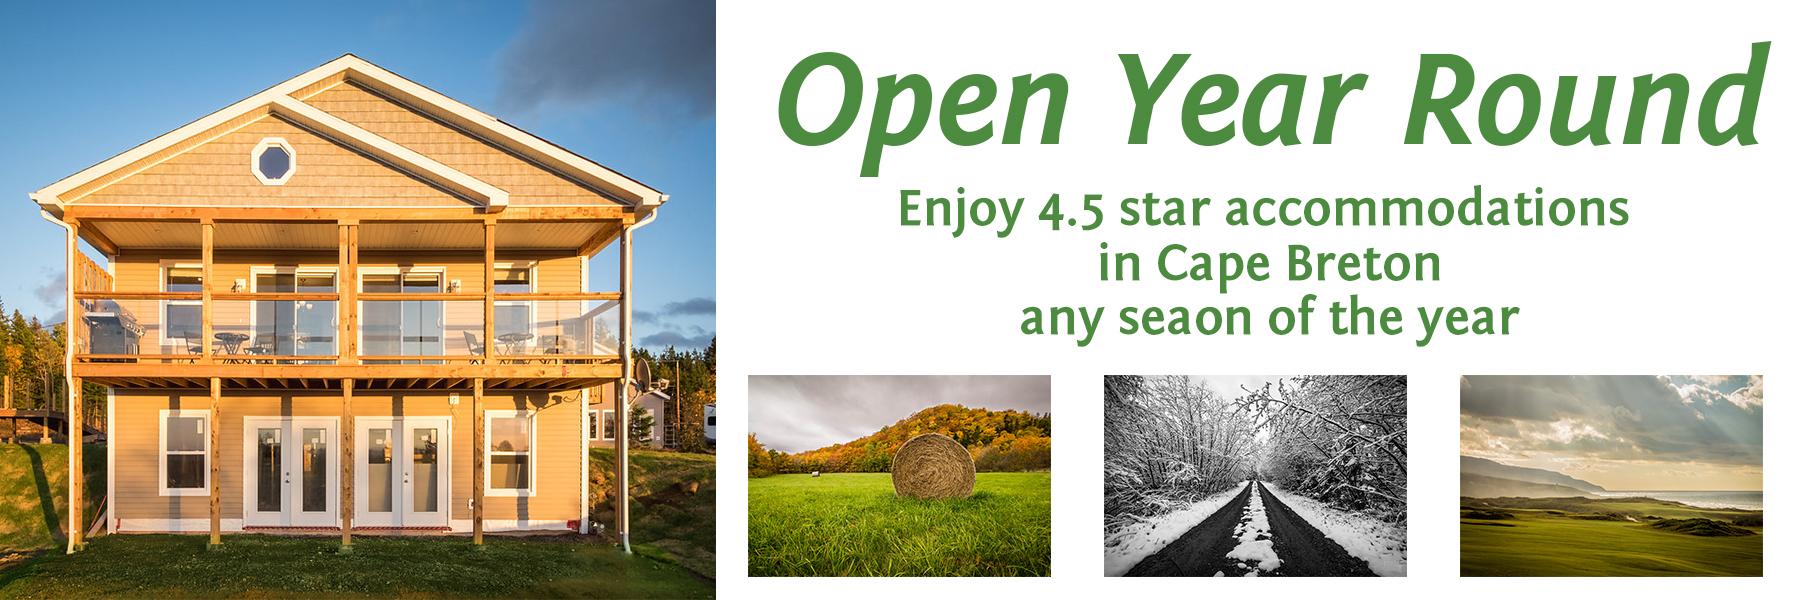 Cape_Breton_Villas_Open_Year_Round